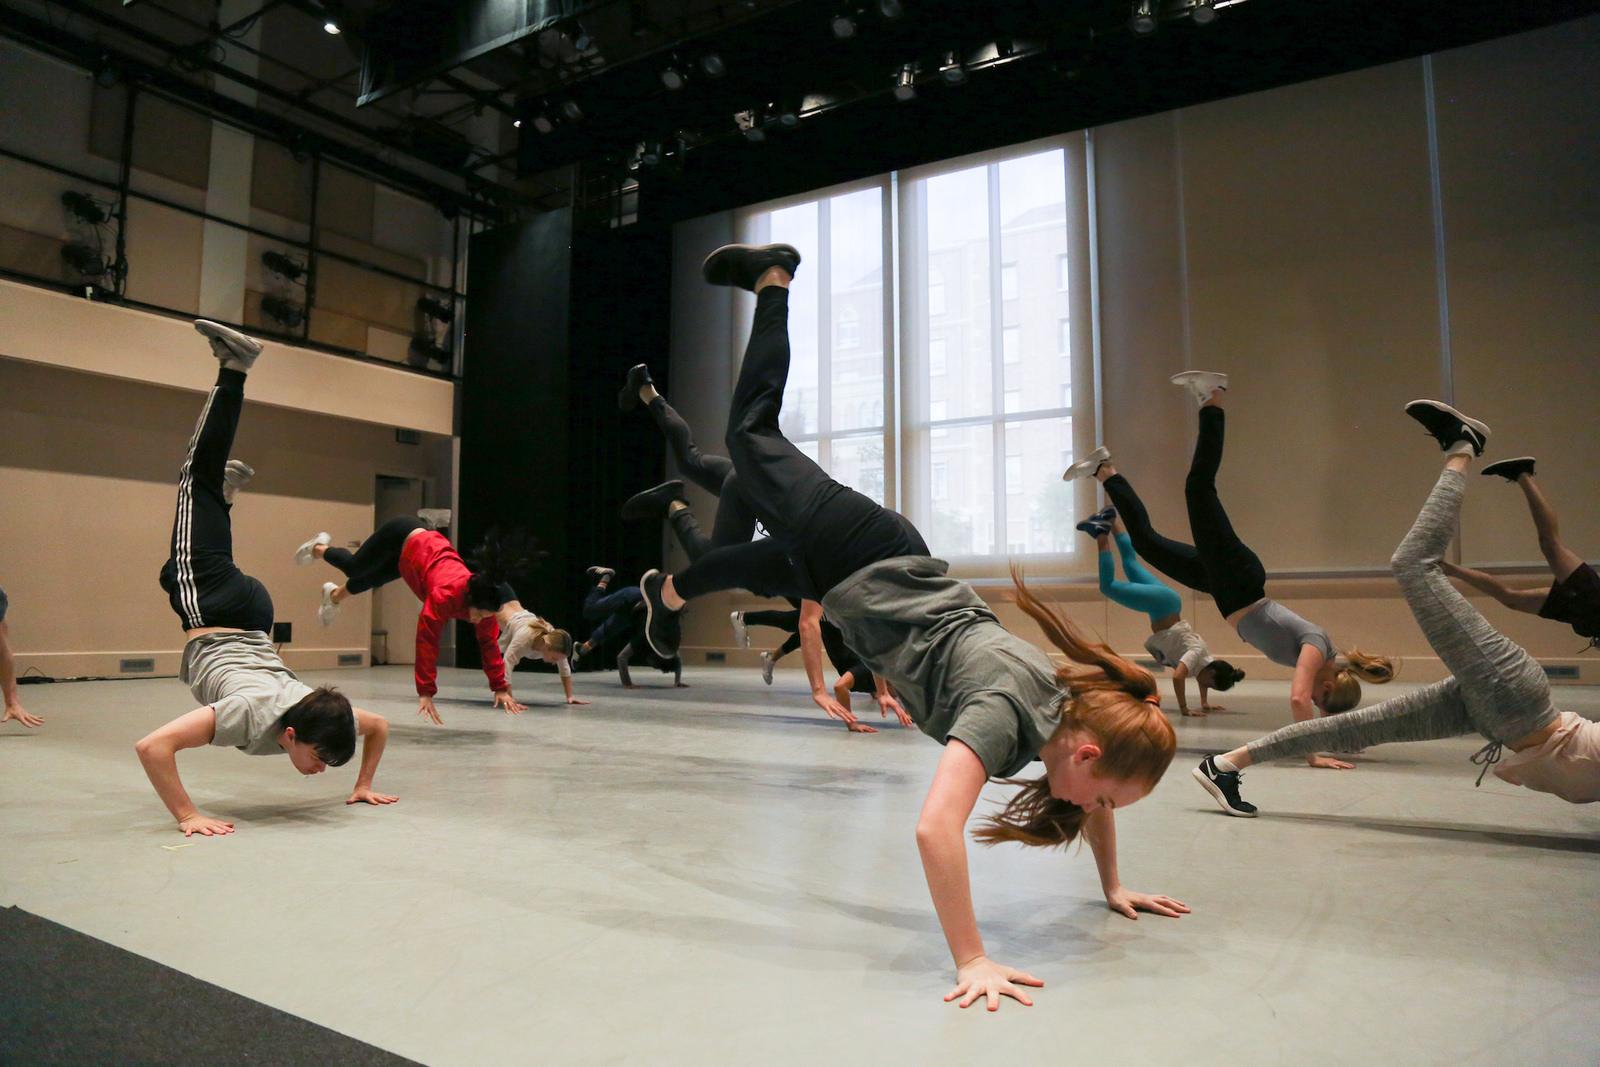 knot-rehearsal-hip-hop